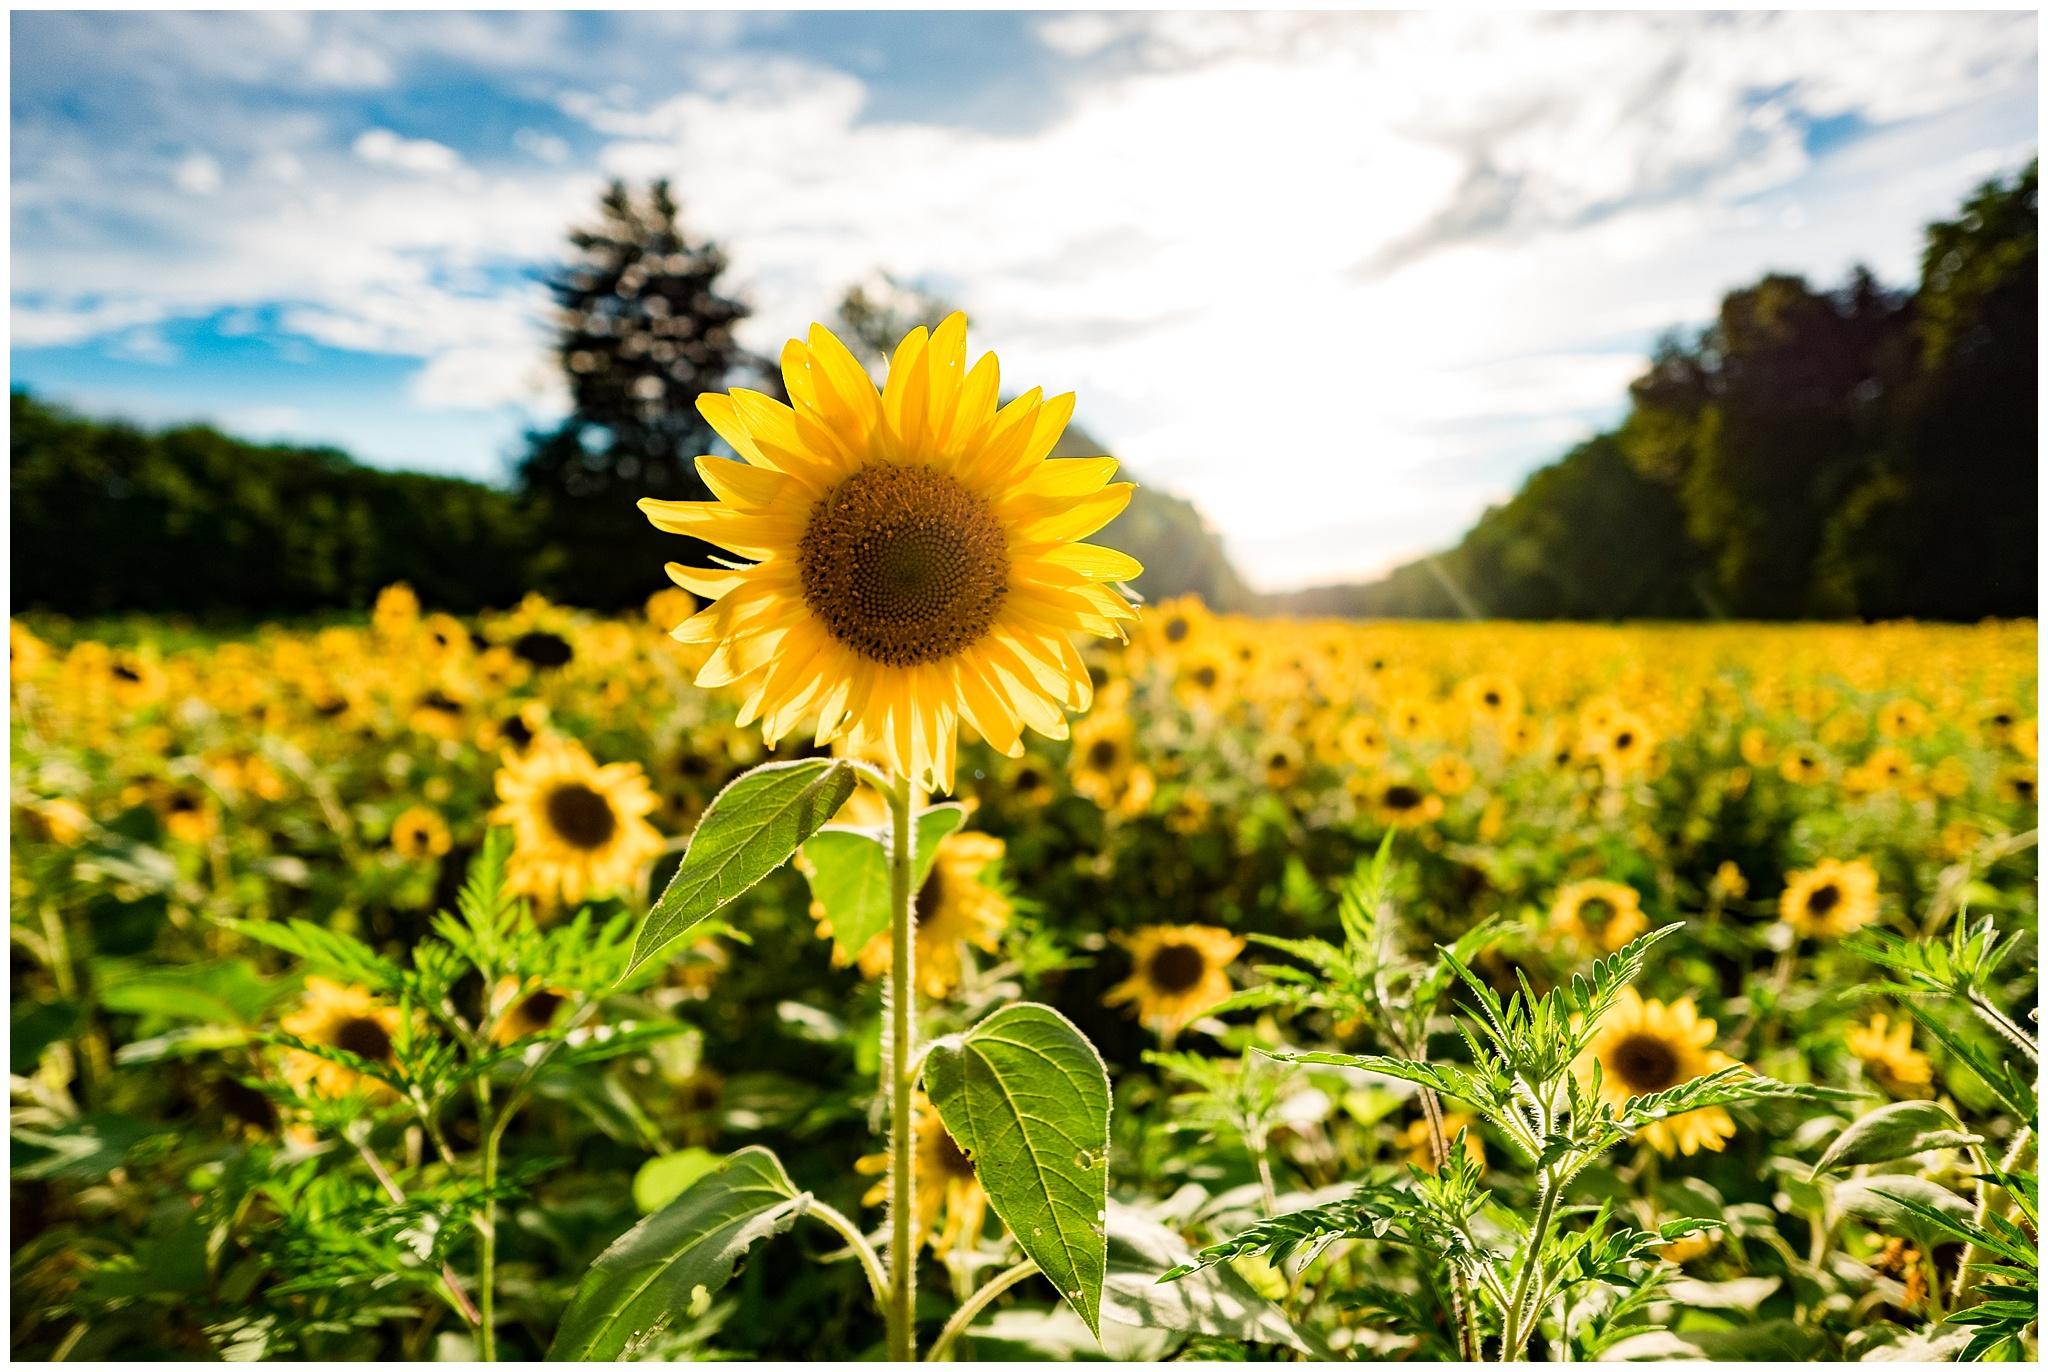 sunflowers_DC_0008.jpg